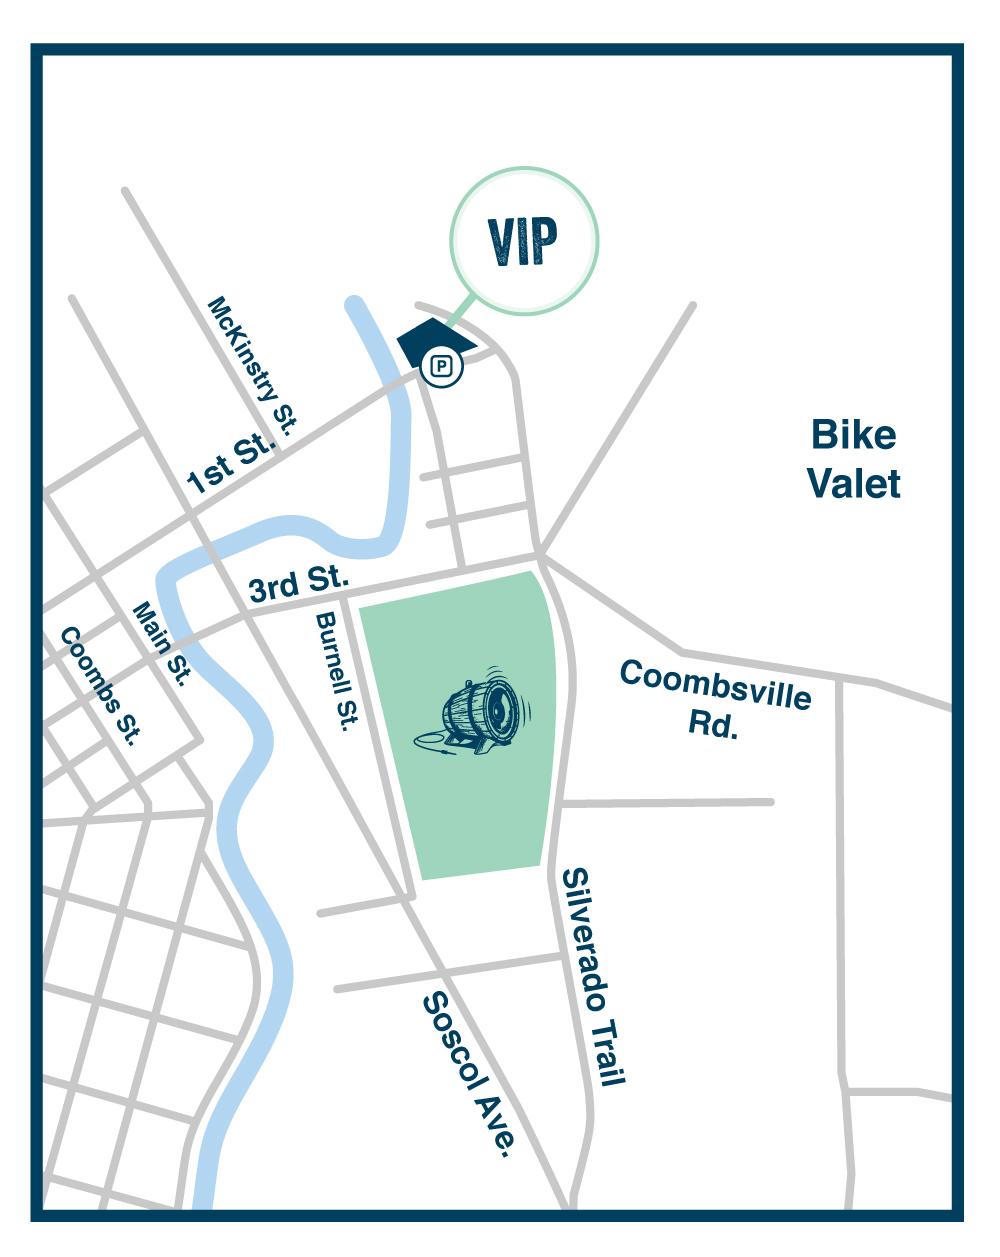 VIP Parking BottleRock 2017 Tickets Fri May 26 2017 at 1030 AM